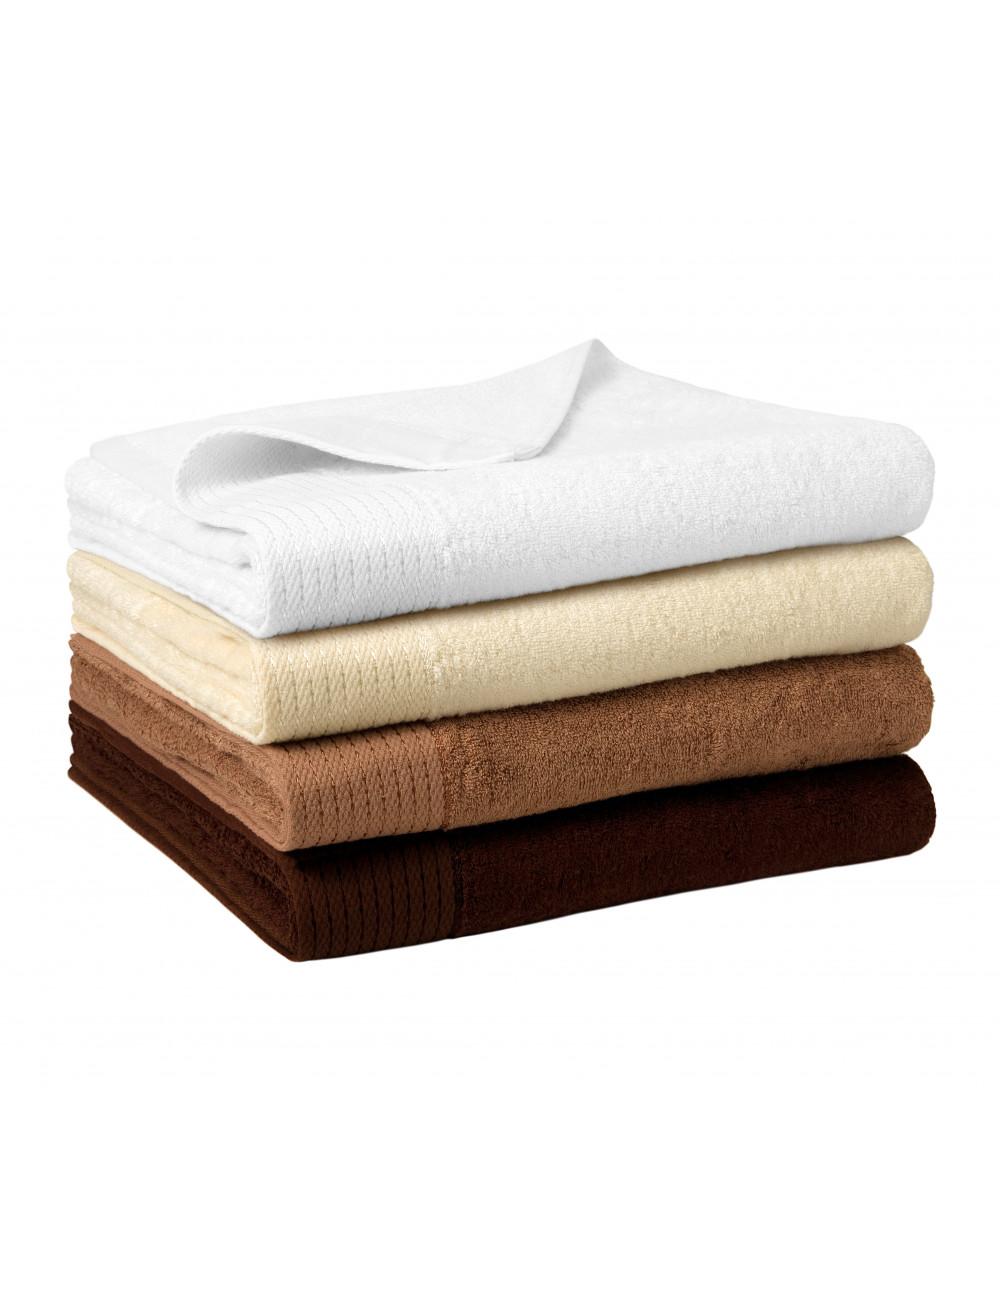 Adler MALFINIPREMIUM Ręcznik duży unisex Bamboo Bath Towel 952 kawowy